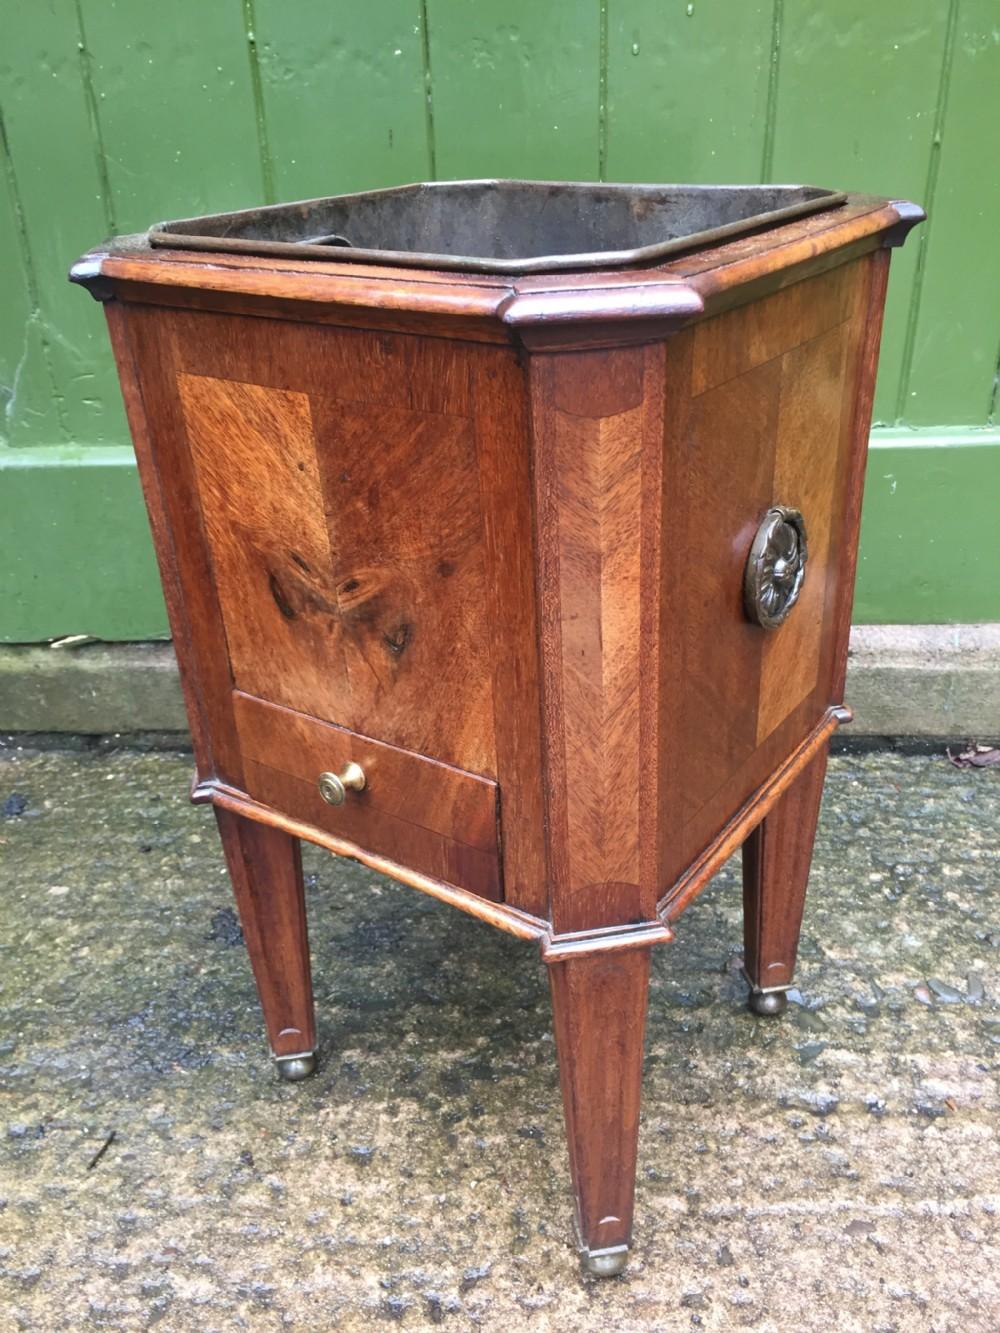 early c19th dutch mahogany 'teestoof' or kettlewarmer of neoclassical design